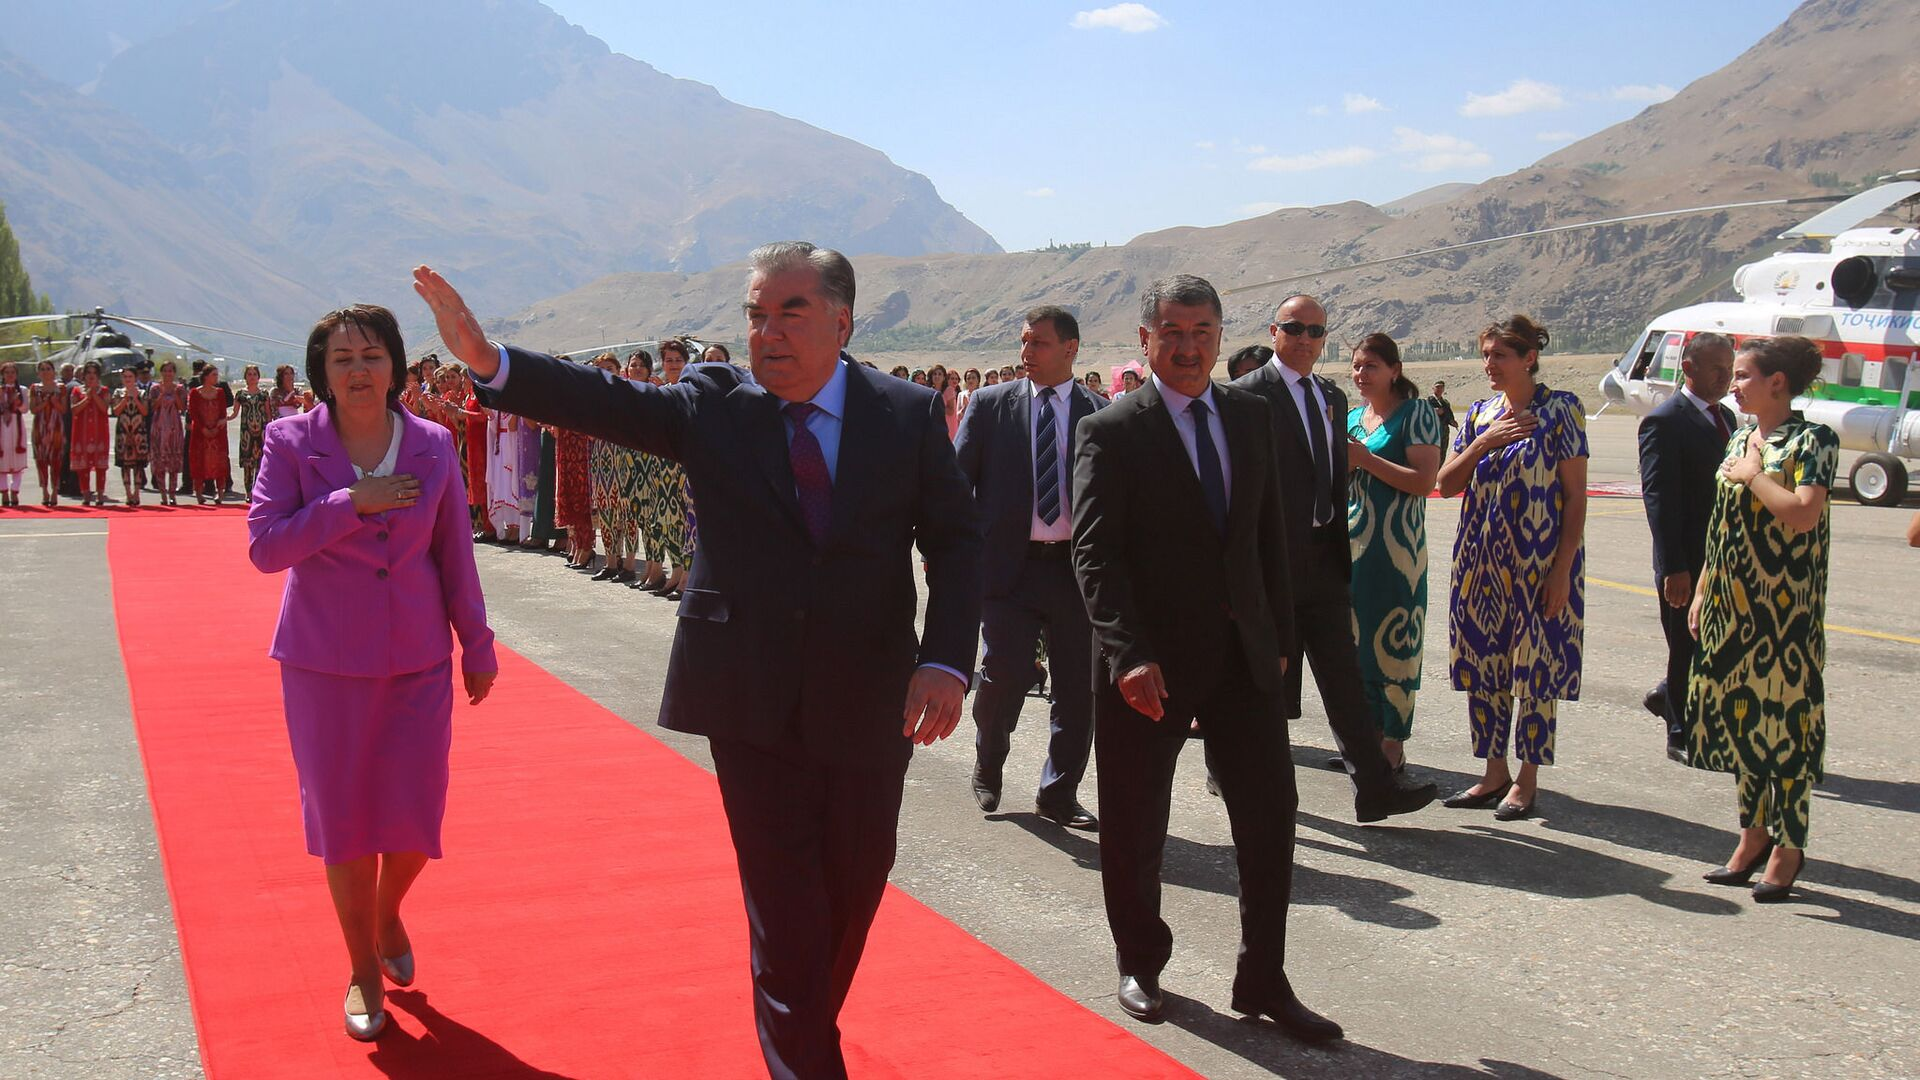 Эмомали Рахмон посетил ГБАО - Sputnik Таджикистан, 1920, 23.09.2021